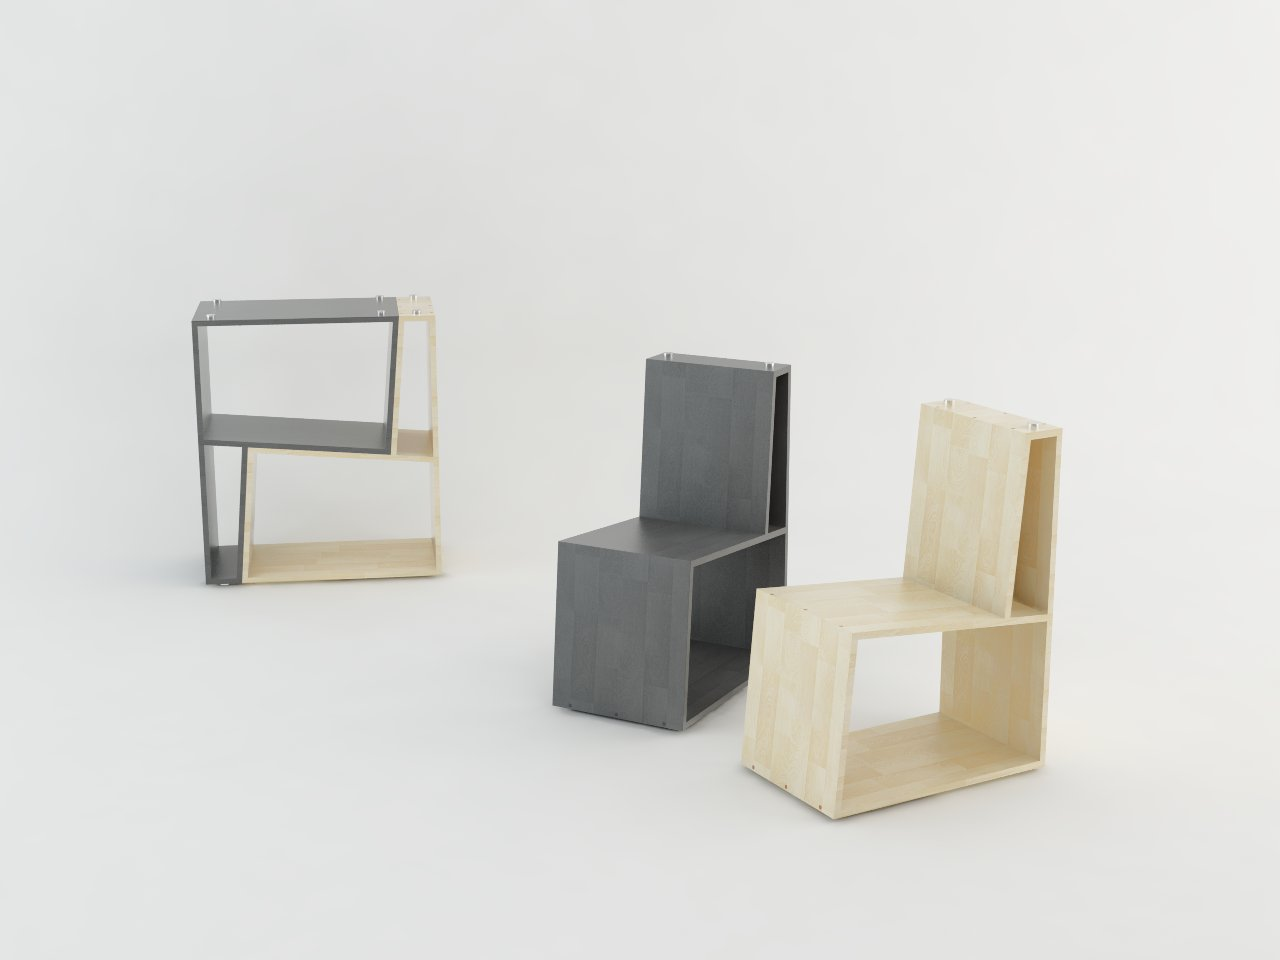 Cadeira Bi / Elemento Diseño, Cortesia de Elemento Diseño